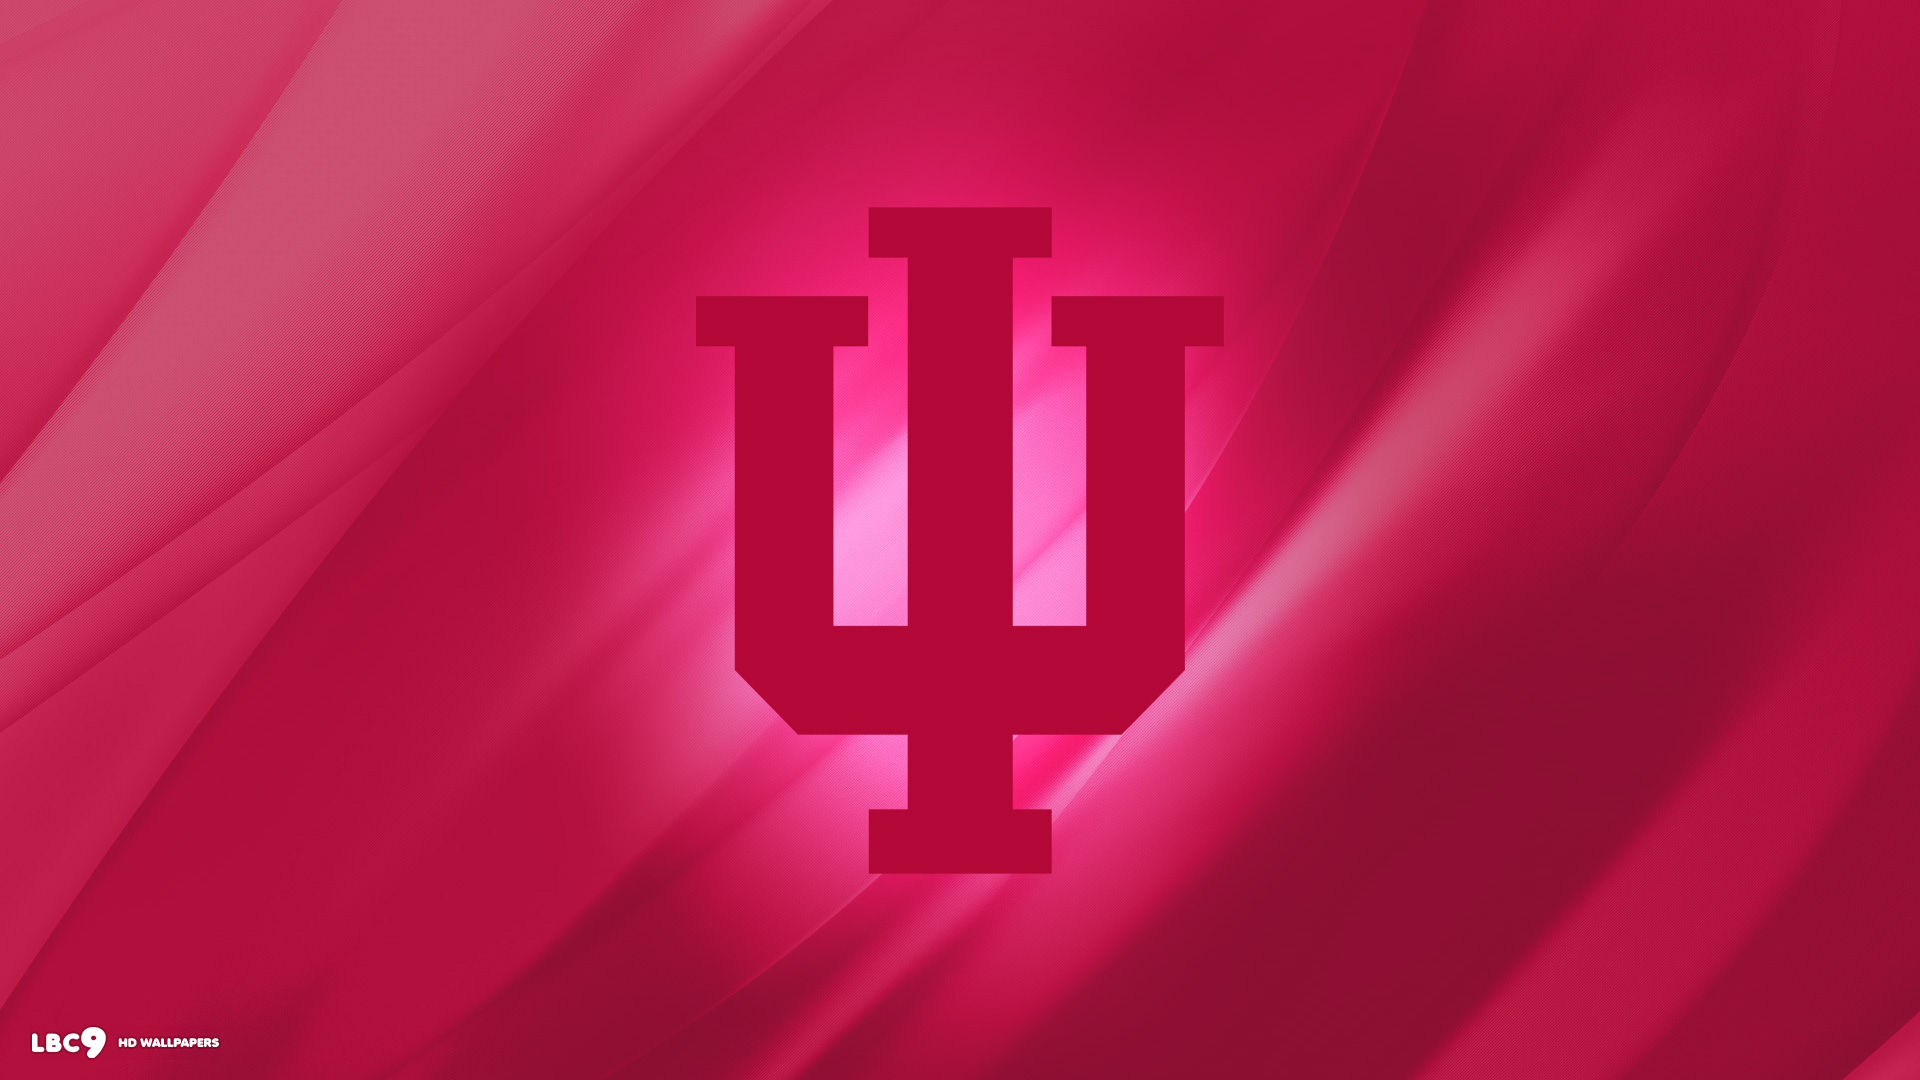 Indiana University Wallpapers 1920x1080